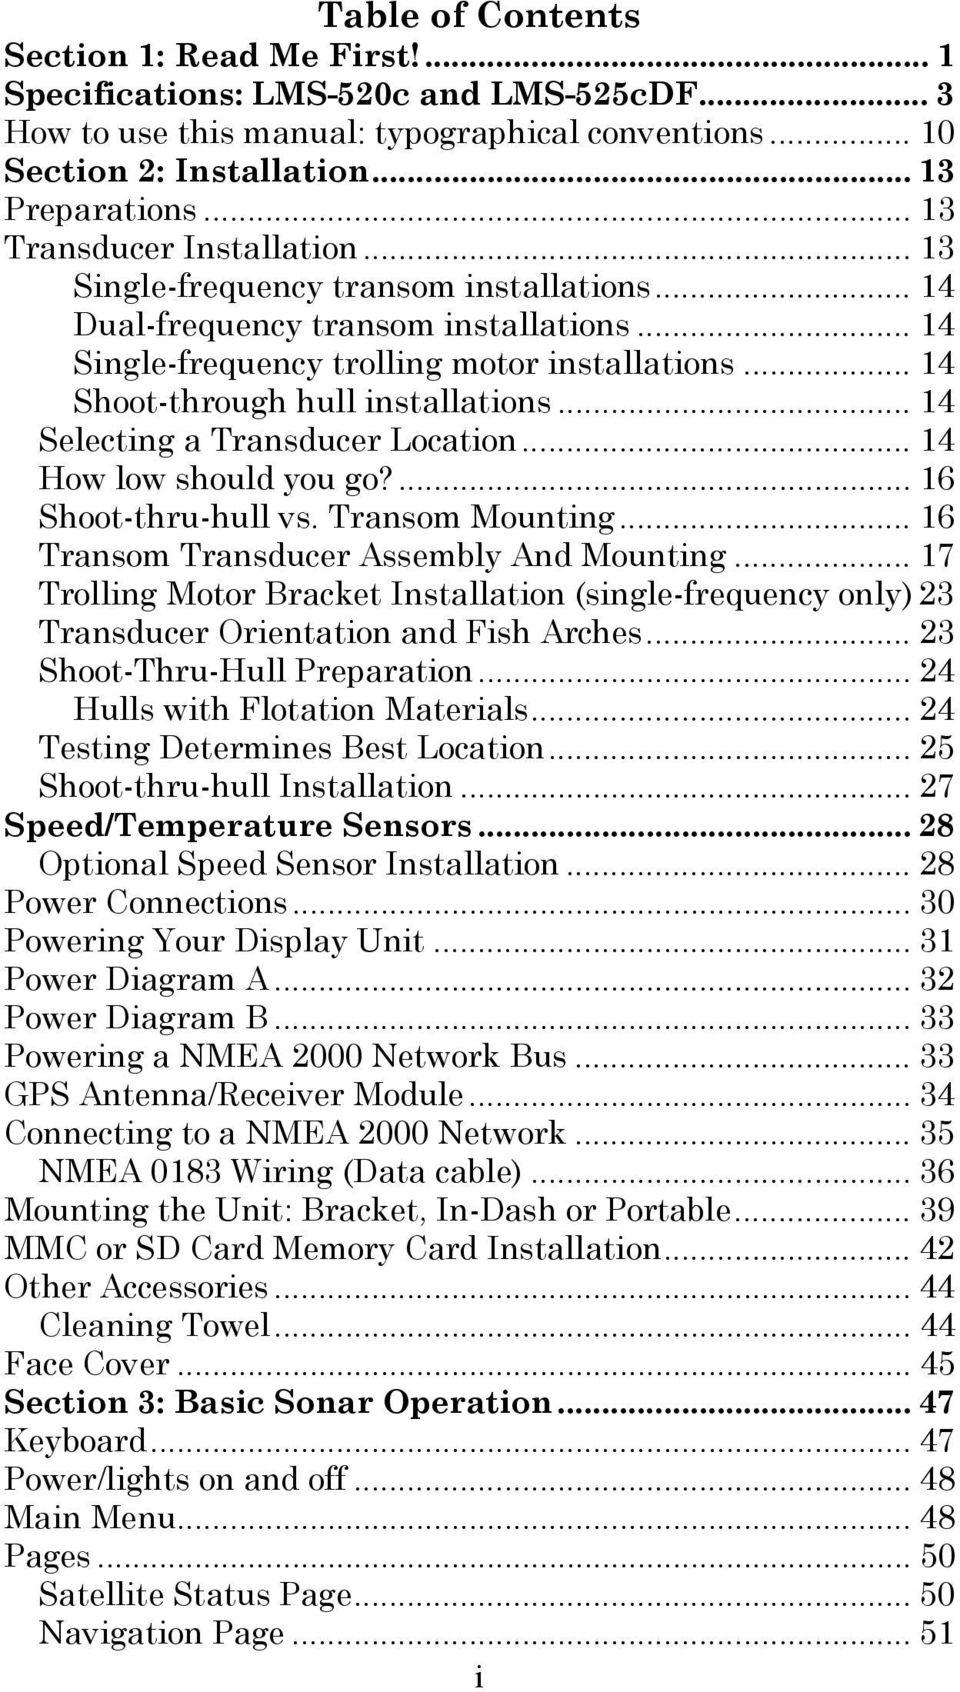 medium resolution of  lms 520c lms 525c df pdf on lowrance power diagram lowrance